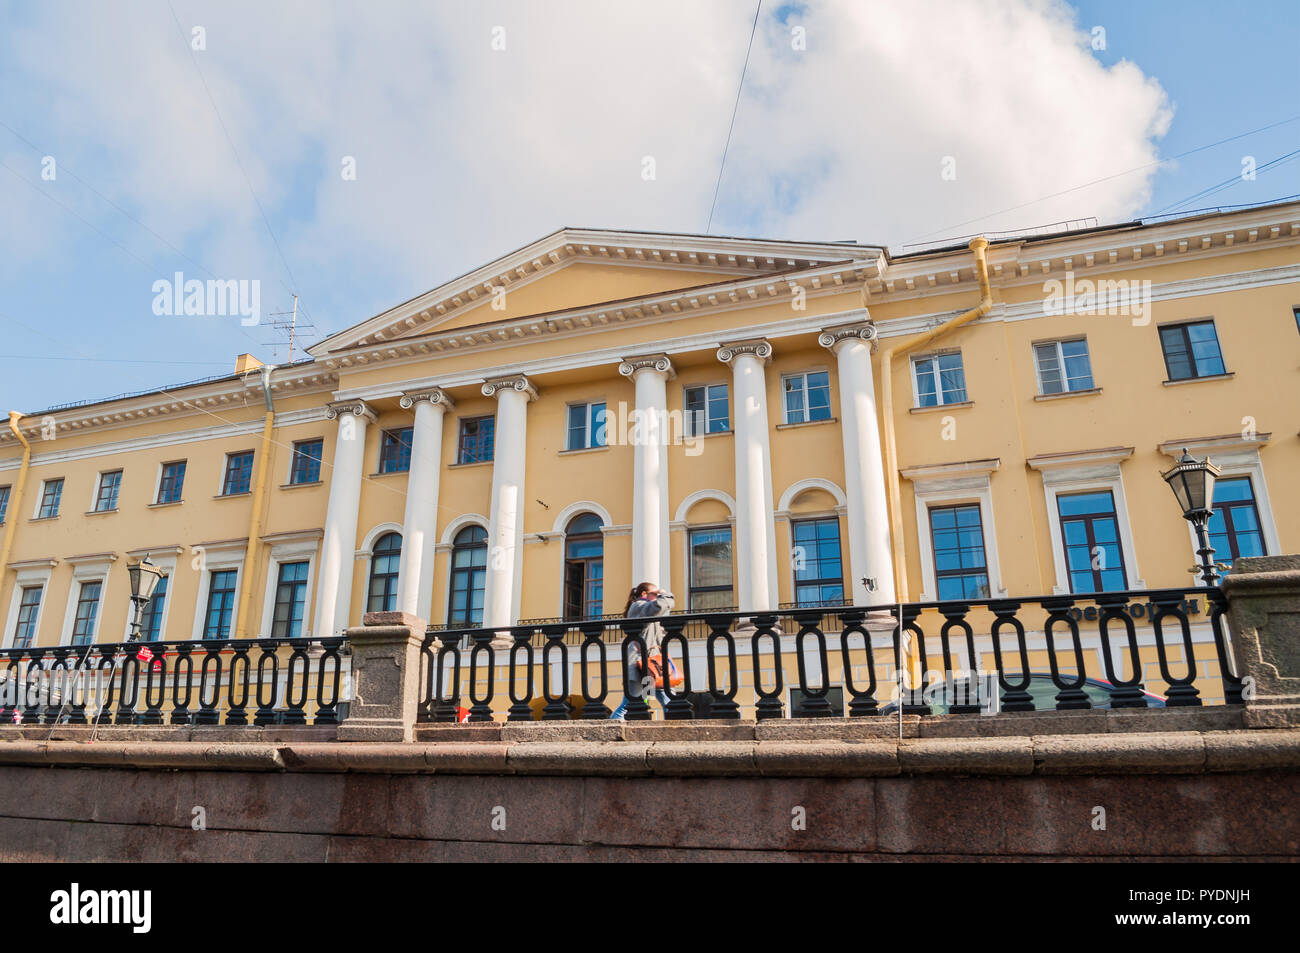 St Saint Petersburg College Stock Photos & St Saint